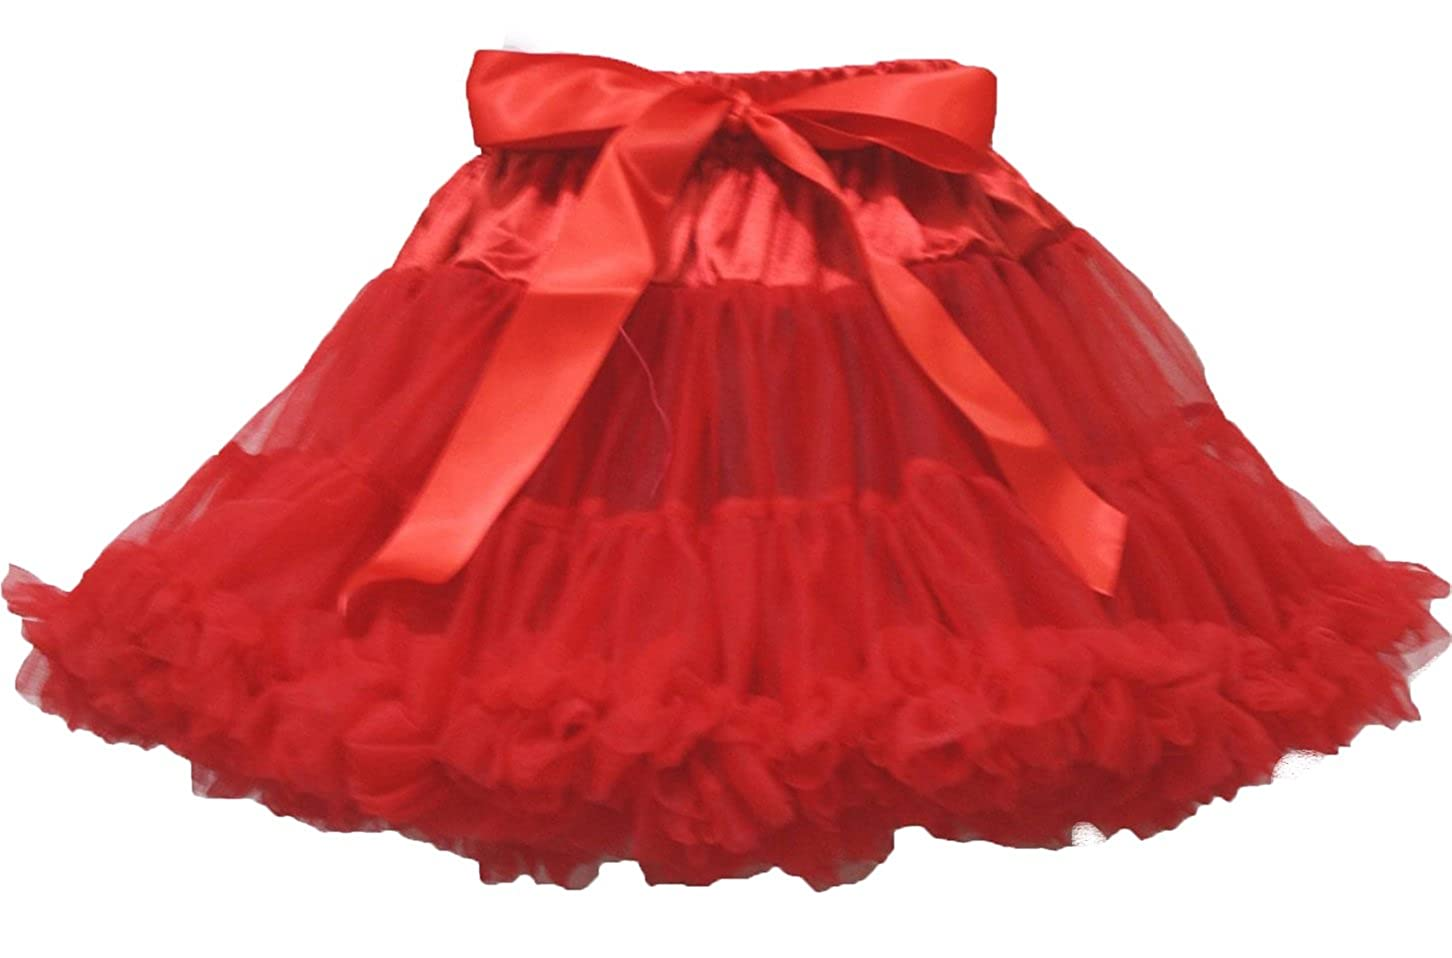 Rojo Pettiskirt tutú de Falda Vestido niña Ropa 1 - 8Y: Amazon.es ...